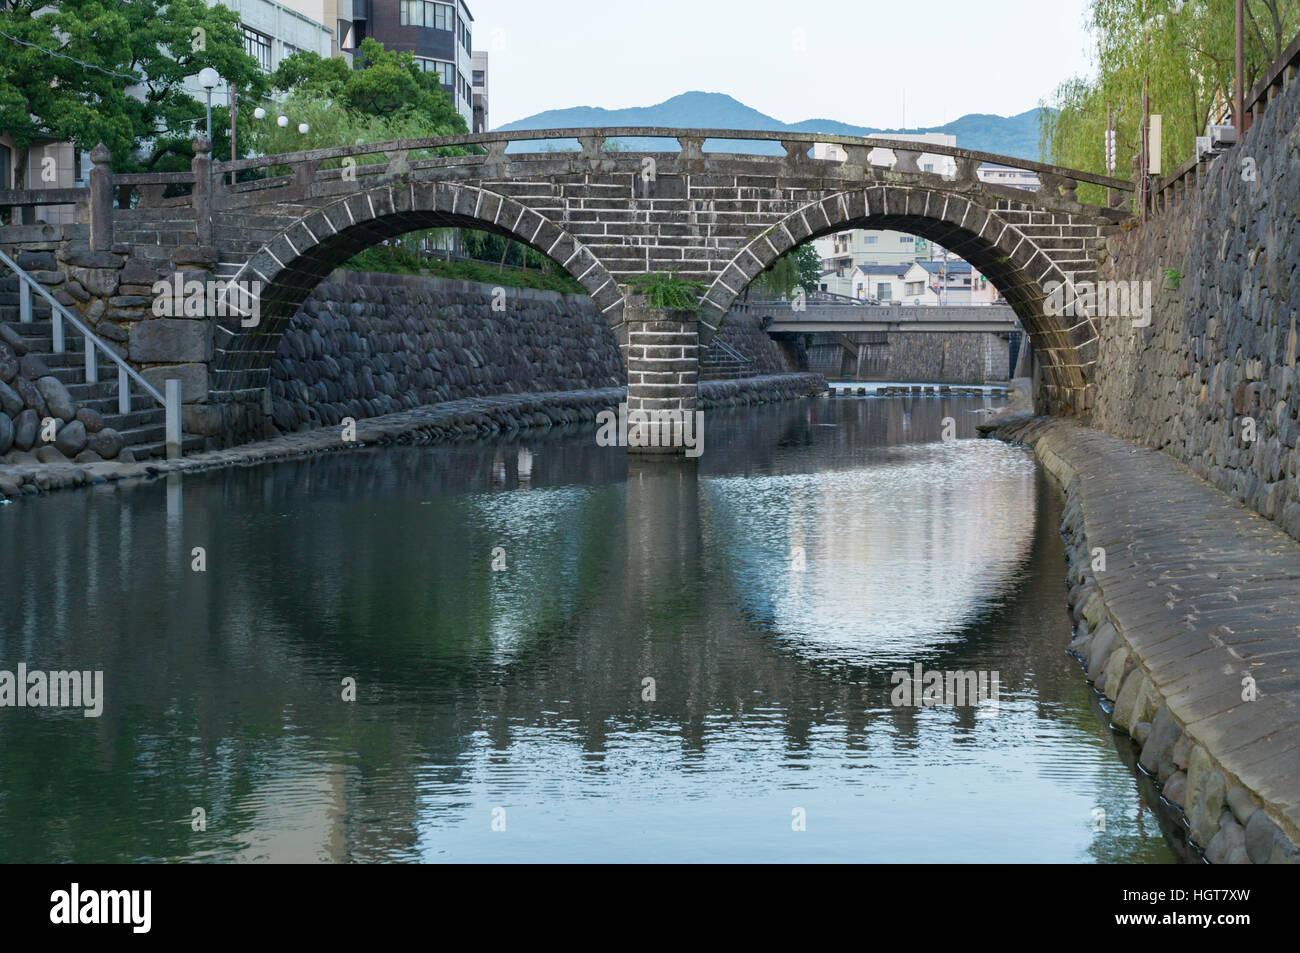 Meganebashi (Spectacles Bridge) in Nagasaki, Japan. - Stock Image